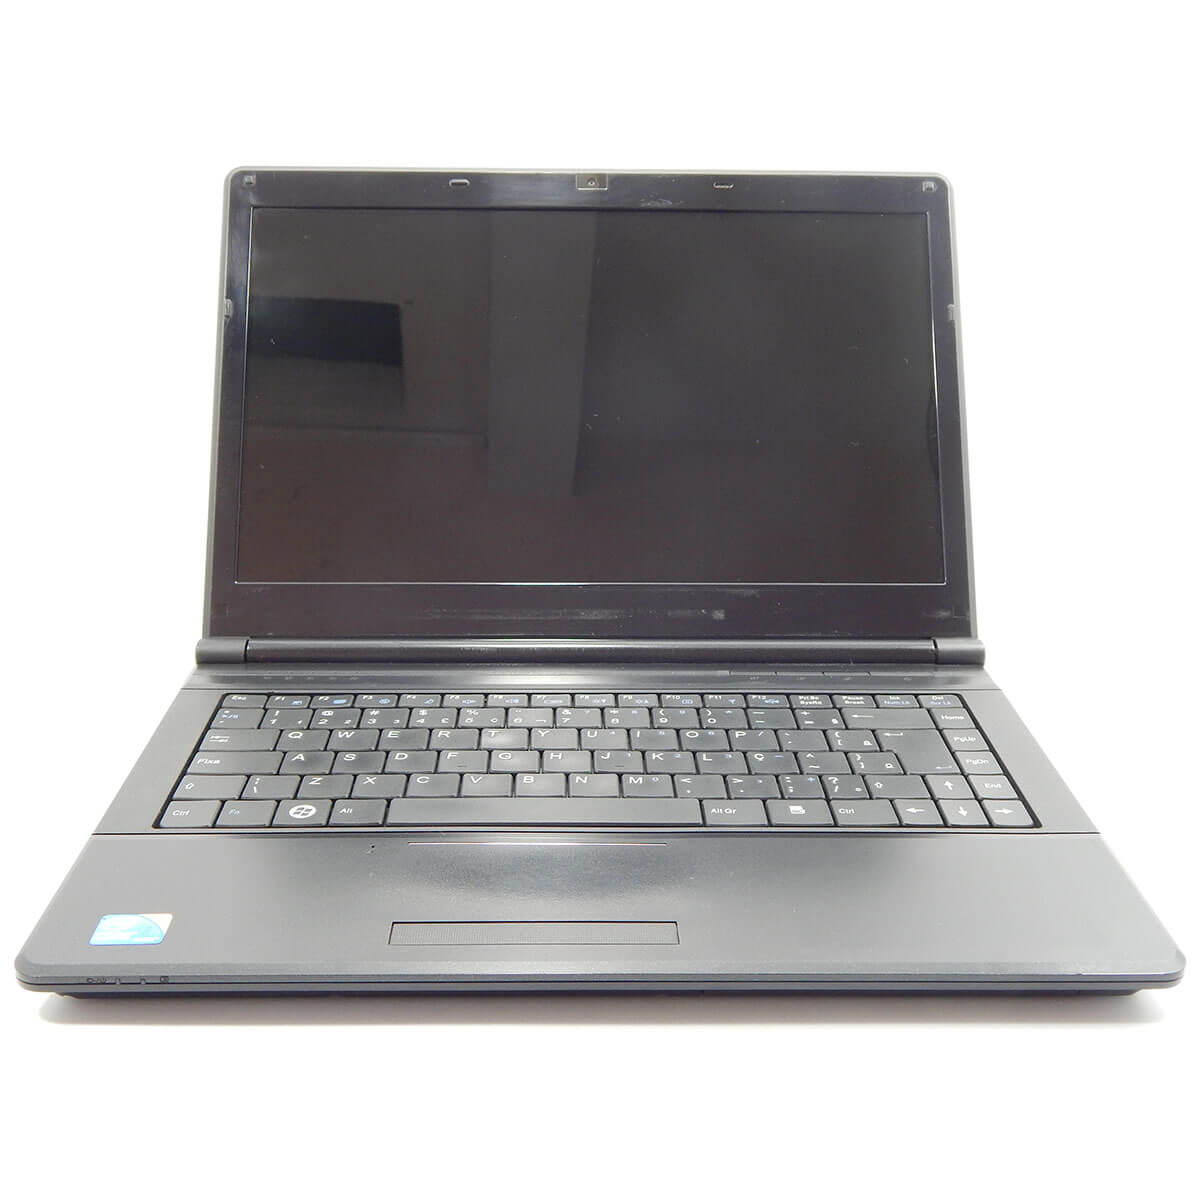 NOTEBOOK POSITIVO SIM I3-M380 4Gb 320Gb Dvd - Seminovo